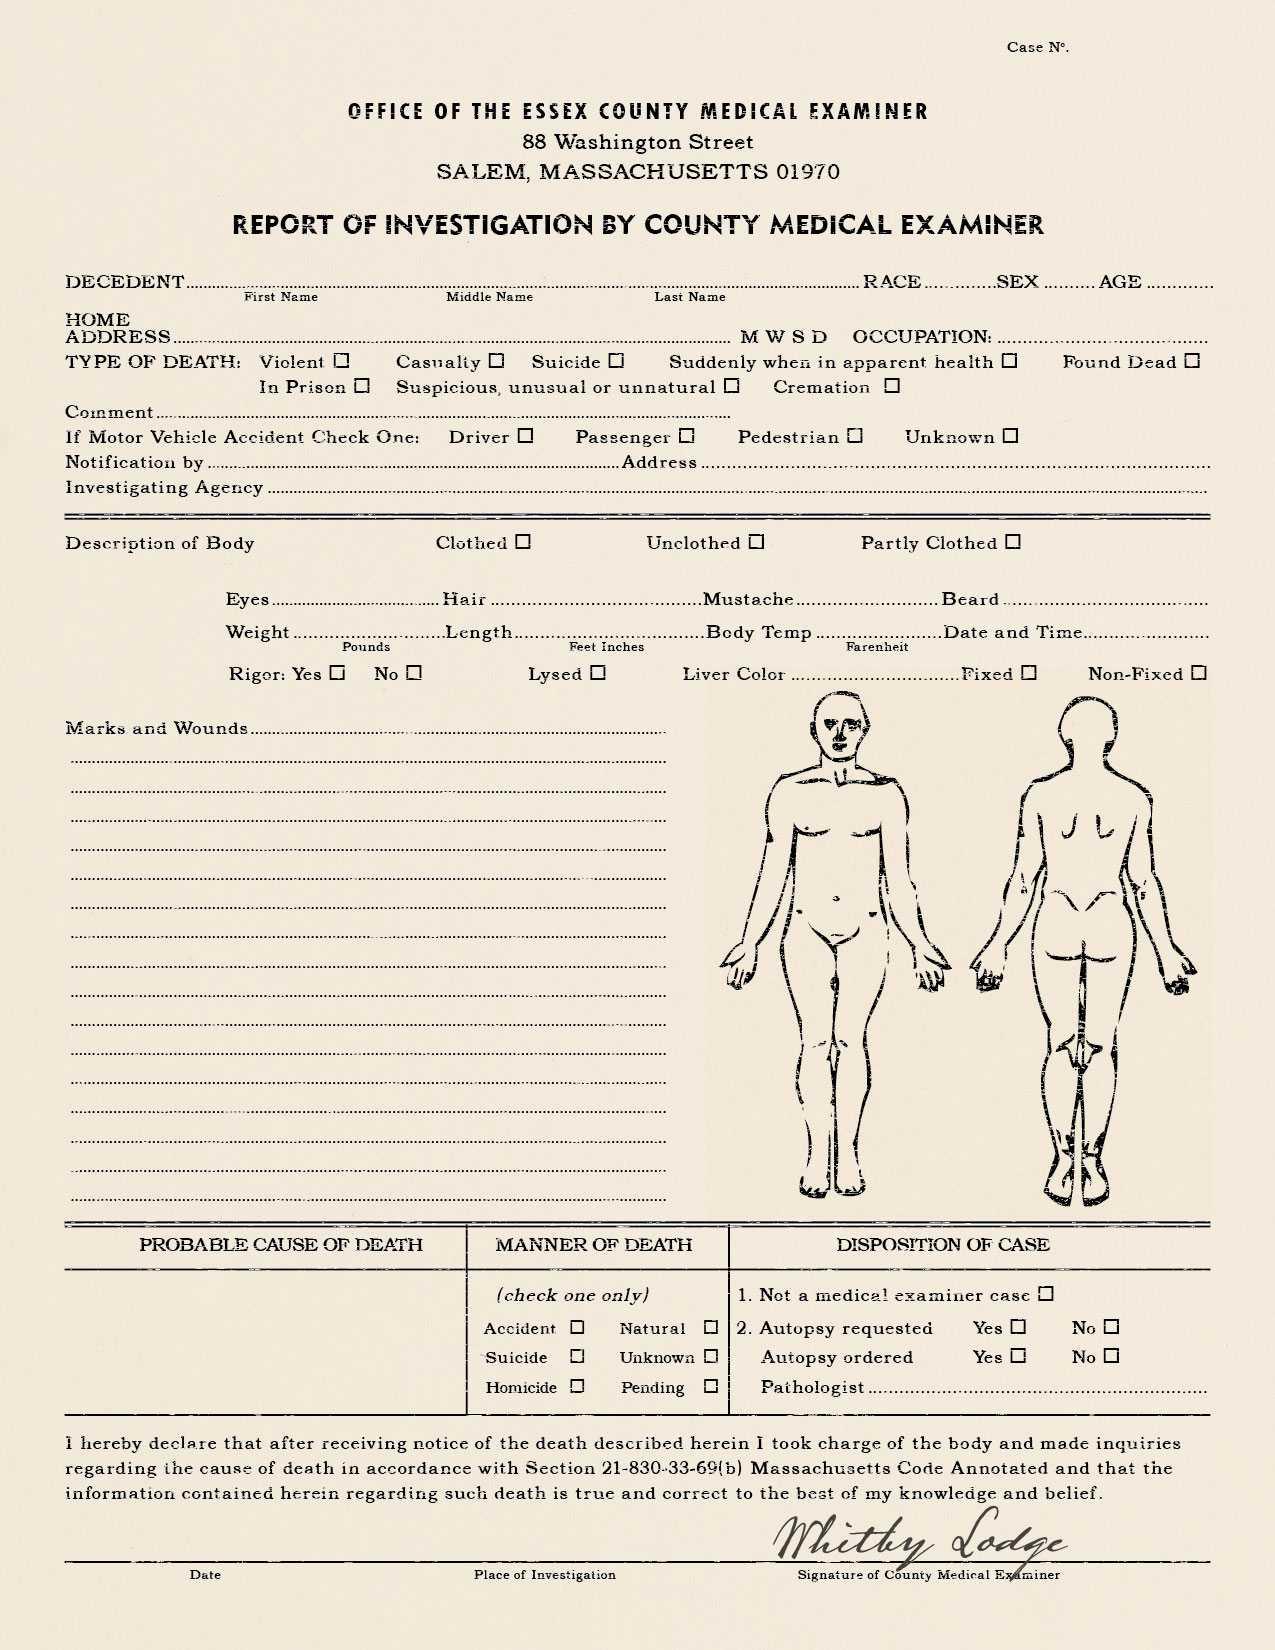 Best Photos Of Coroner's Report Template - Blank Autopsy Intended For Coroner's Report Template